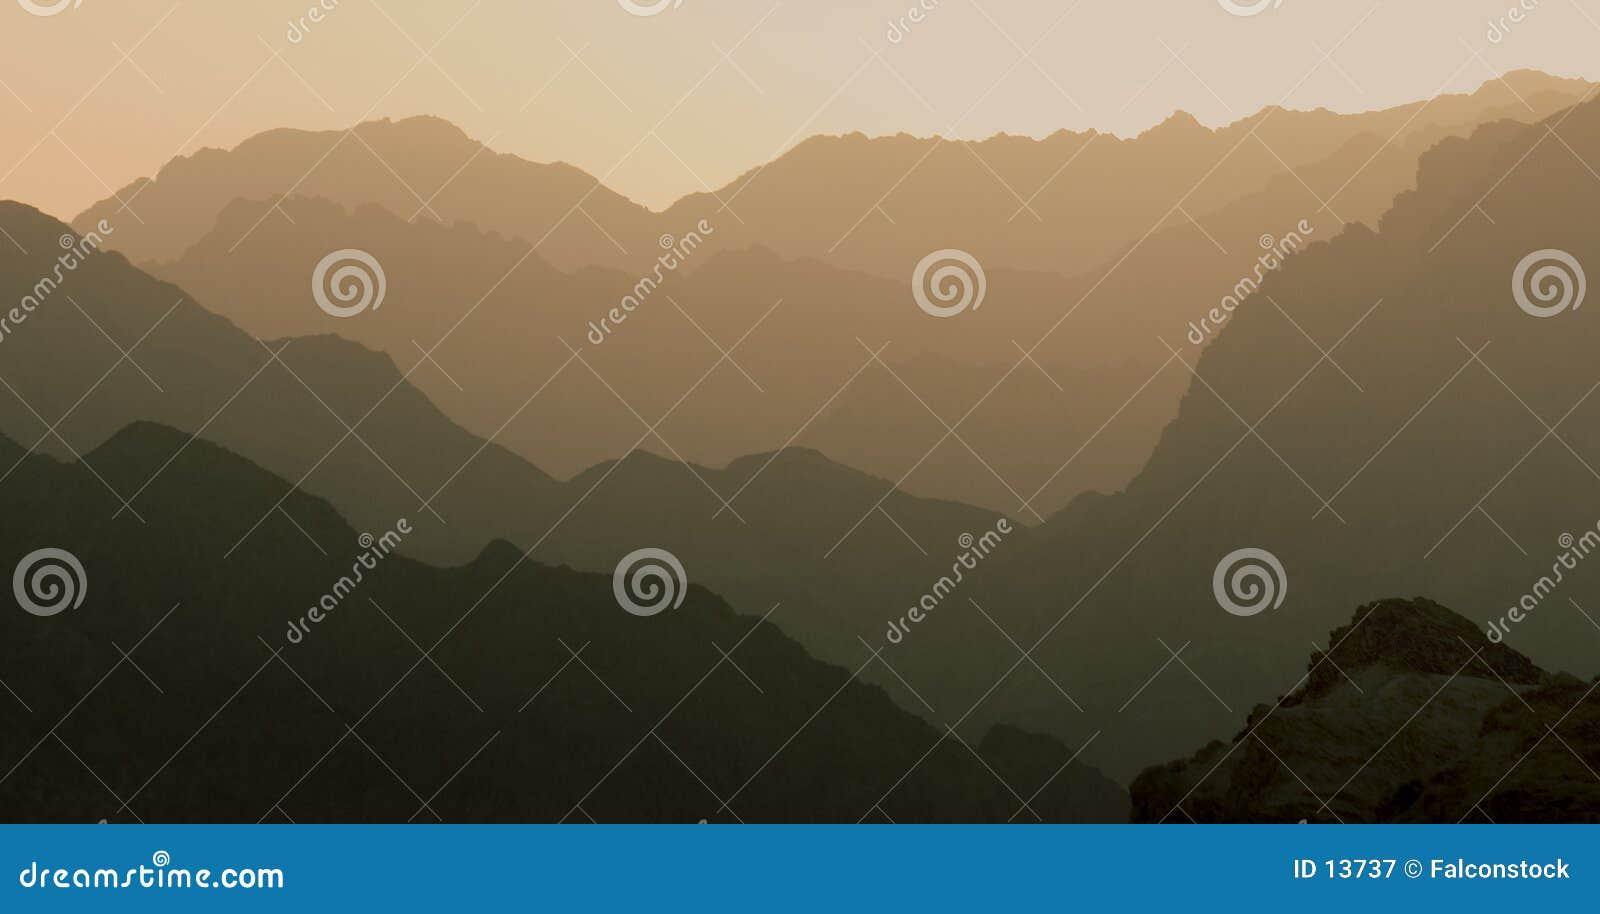 Perfect Layered Mountain